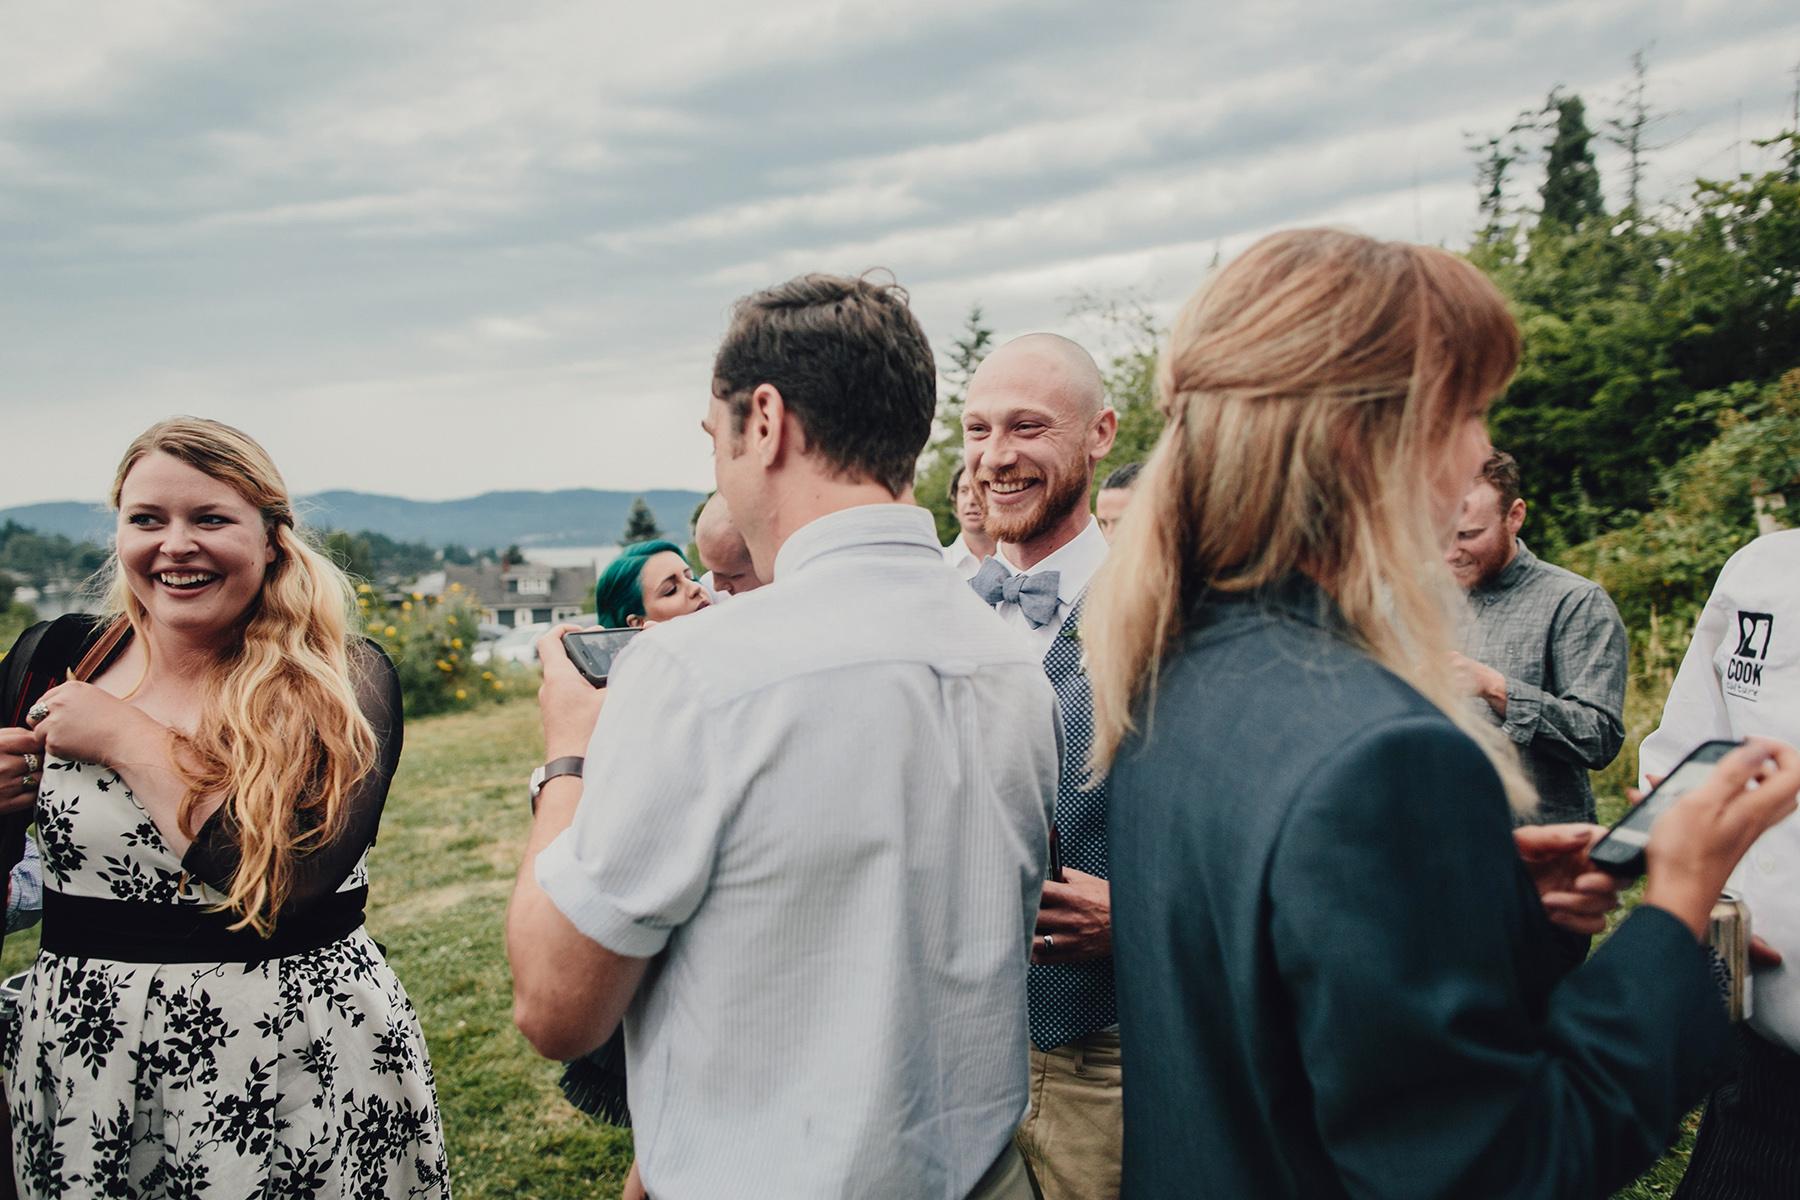 kildara-farms-wedding-photo-inspiration-0098